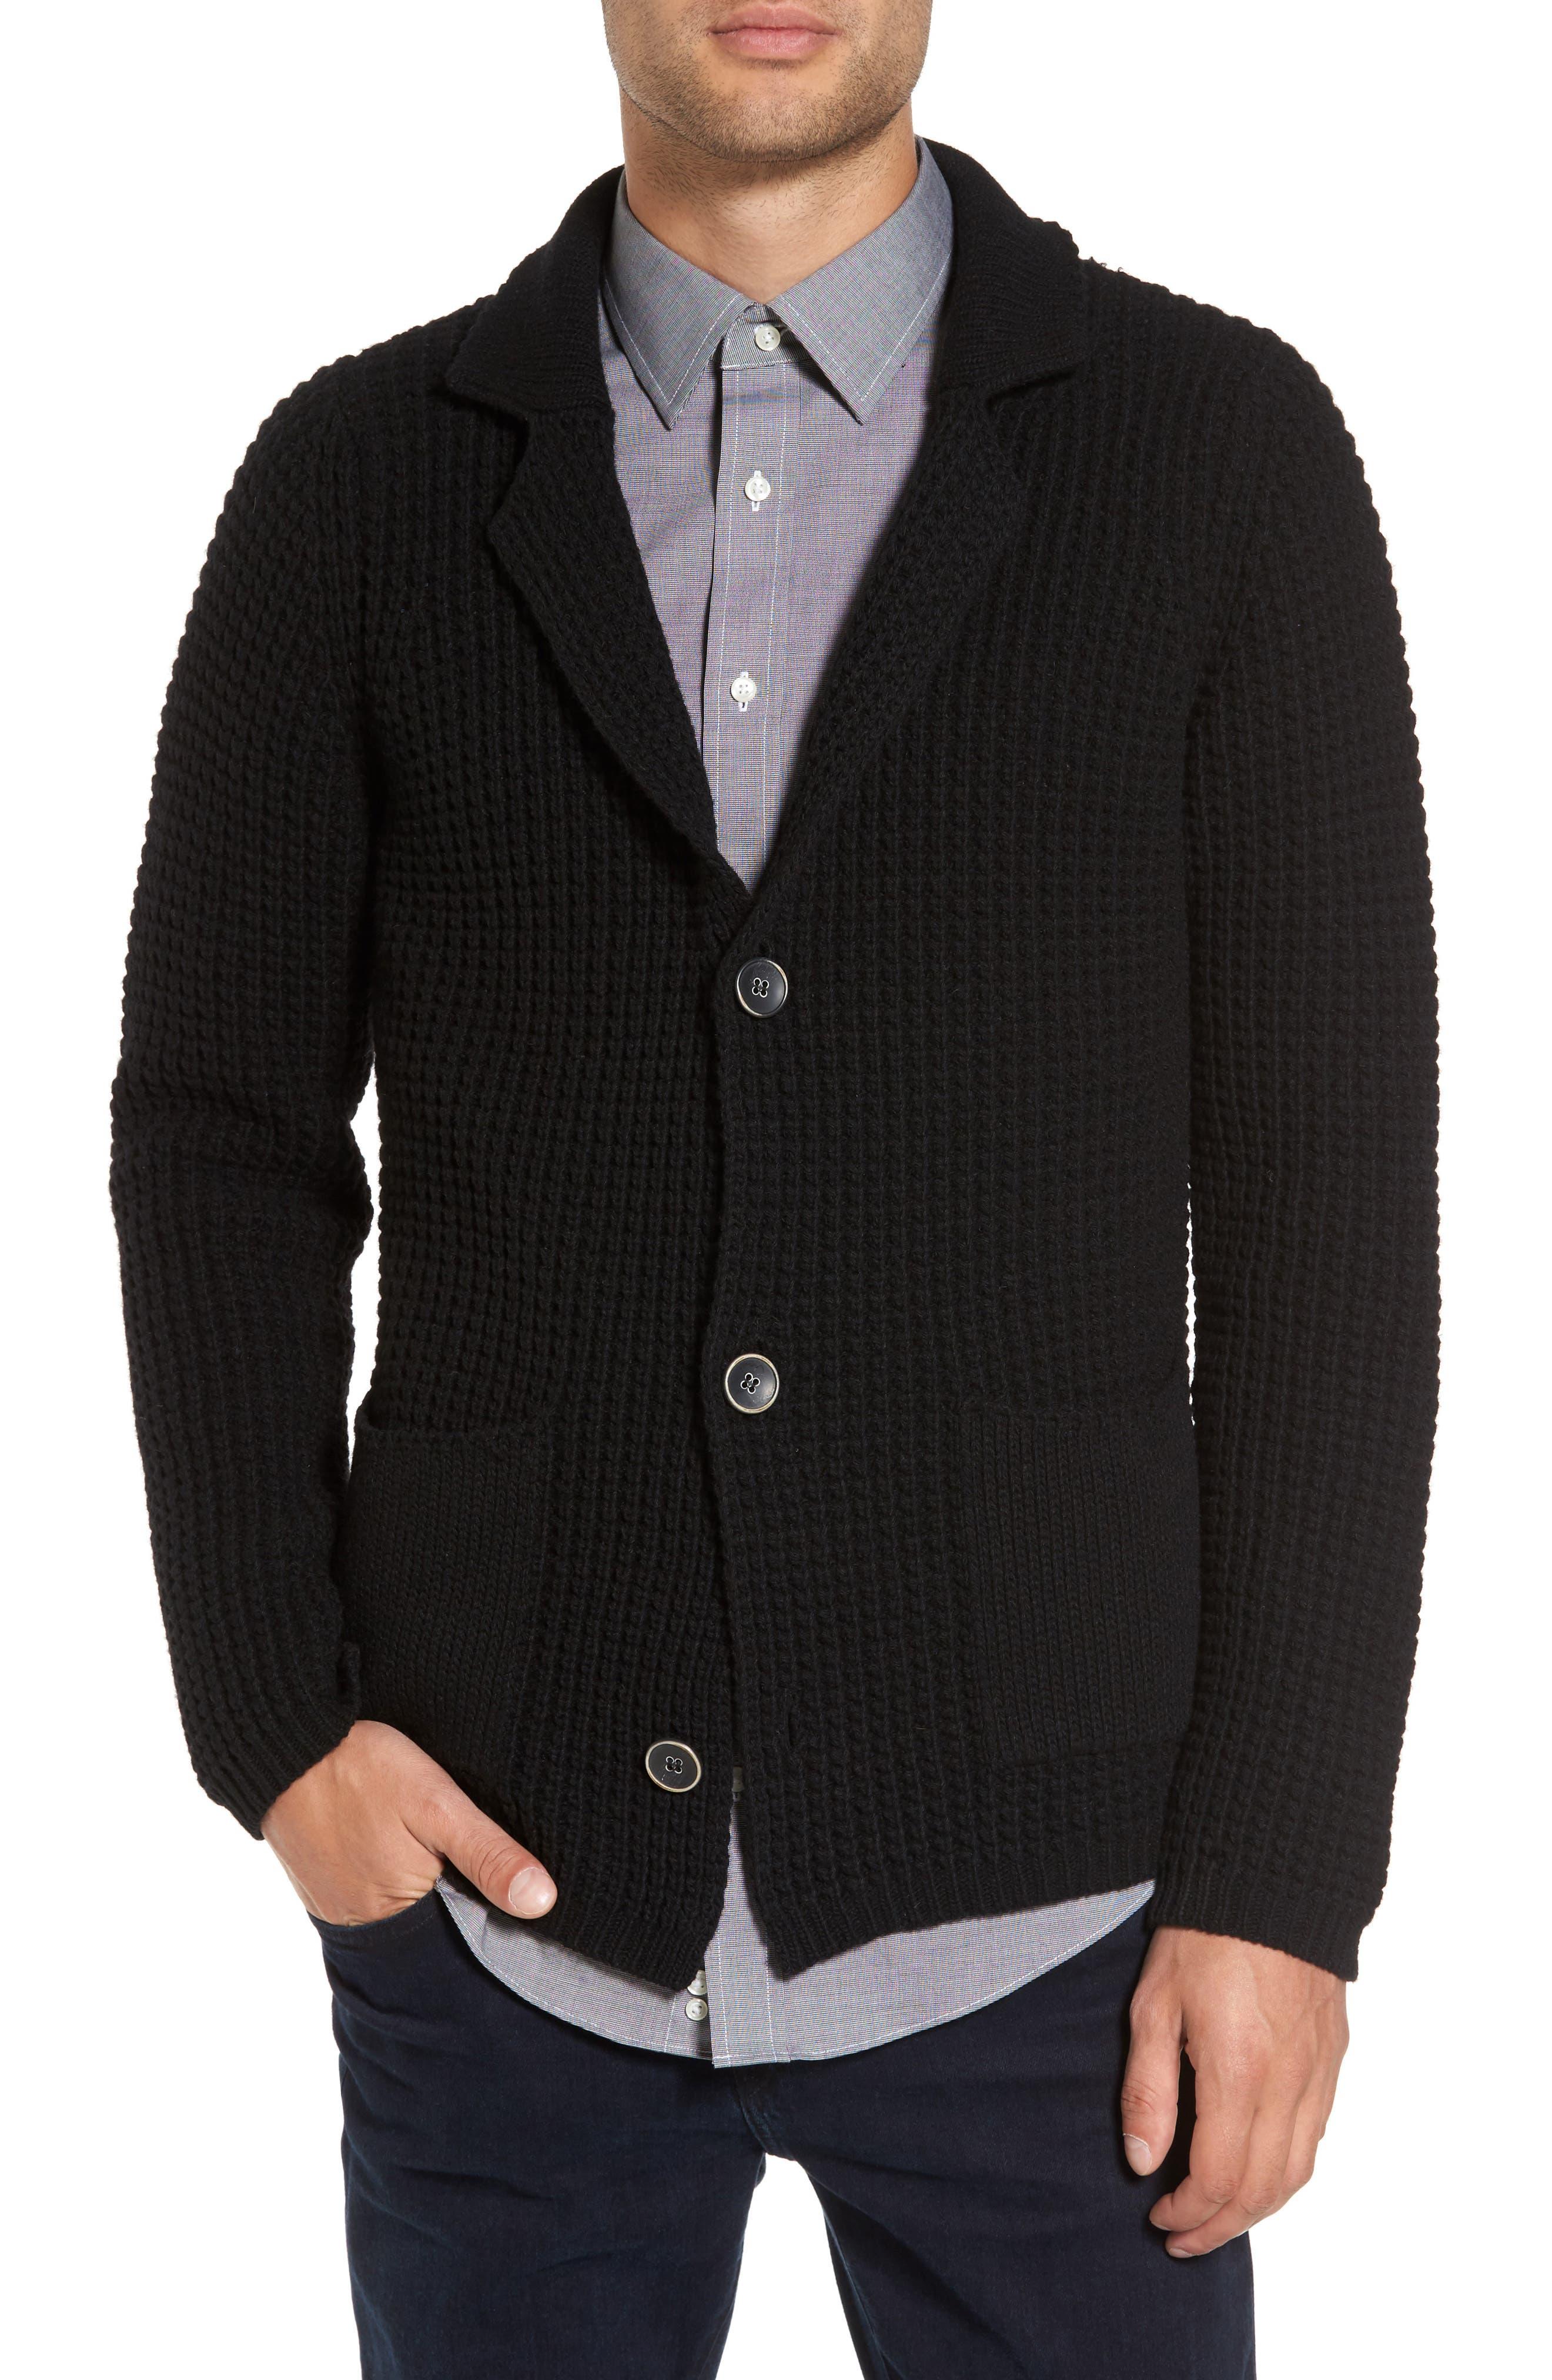 Alternate Image 1 Selected - Sand Trim Fit Knit Cardigan Jacket